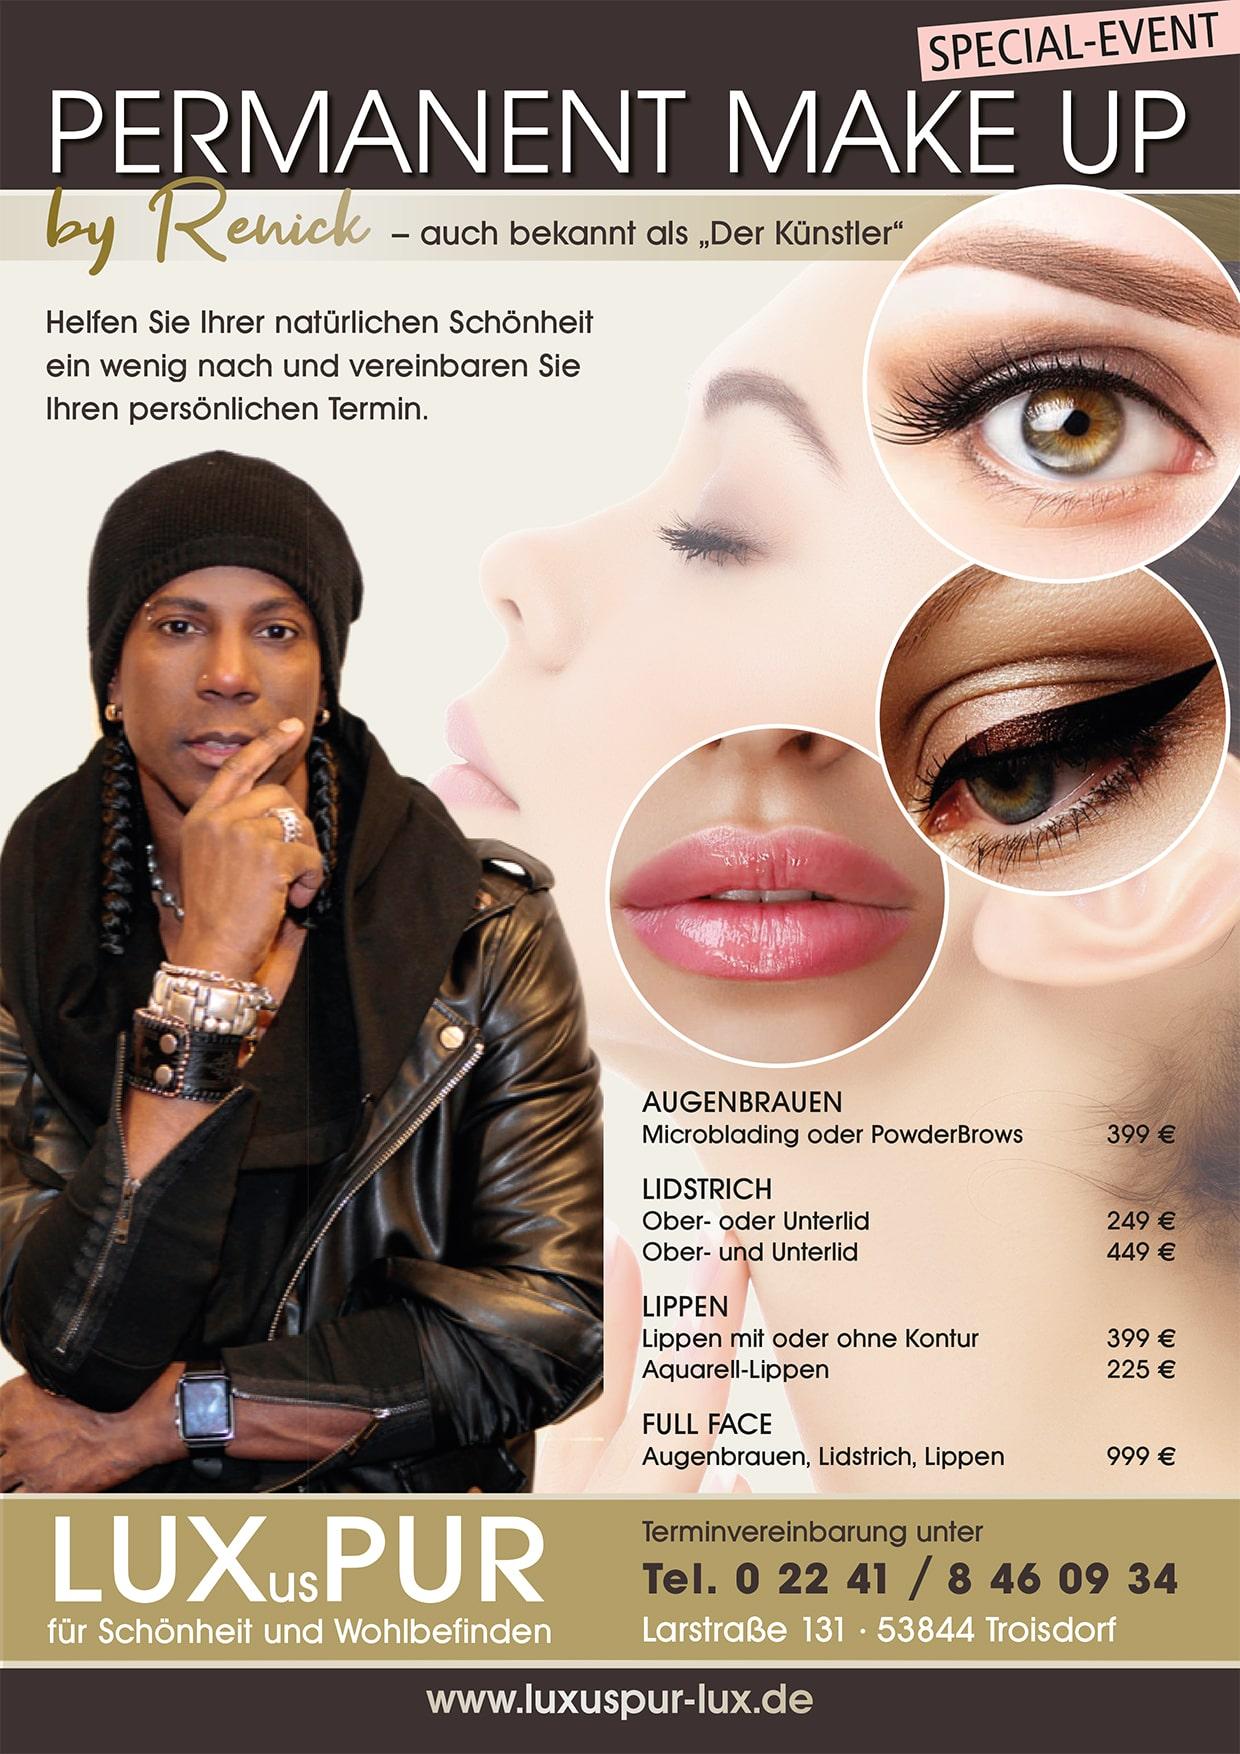 Permanent Makeup mit Renick, der Kuenstler